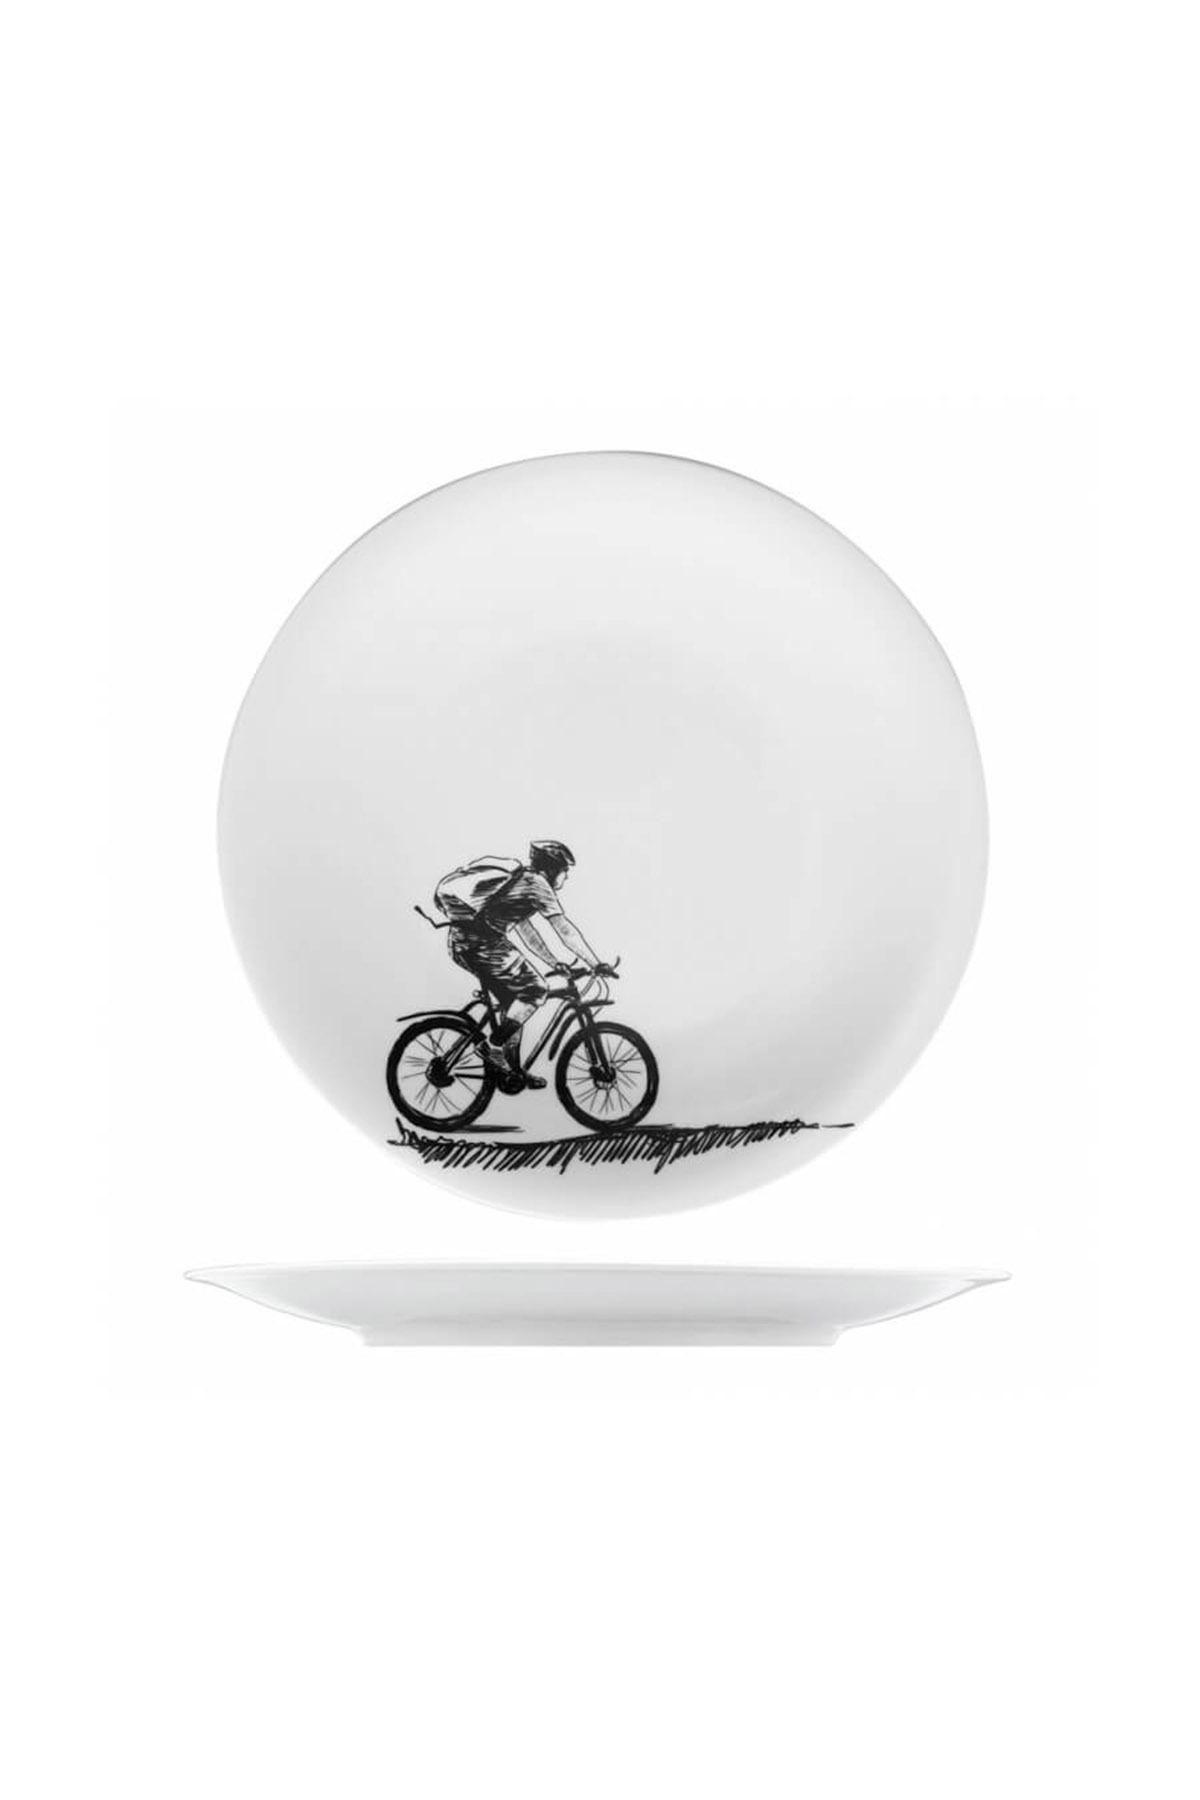 KÜTAHYA PORSELEN - Kütahya Porselen Centilmen Serisi Pasta Tabağı Bisiklet